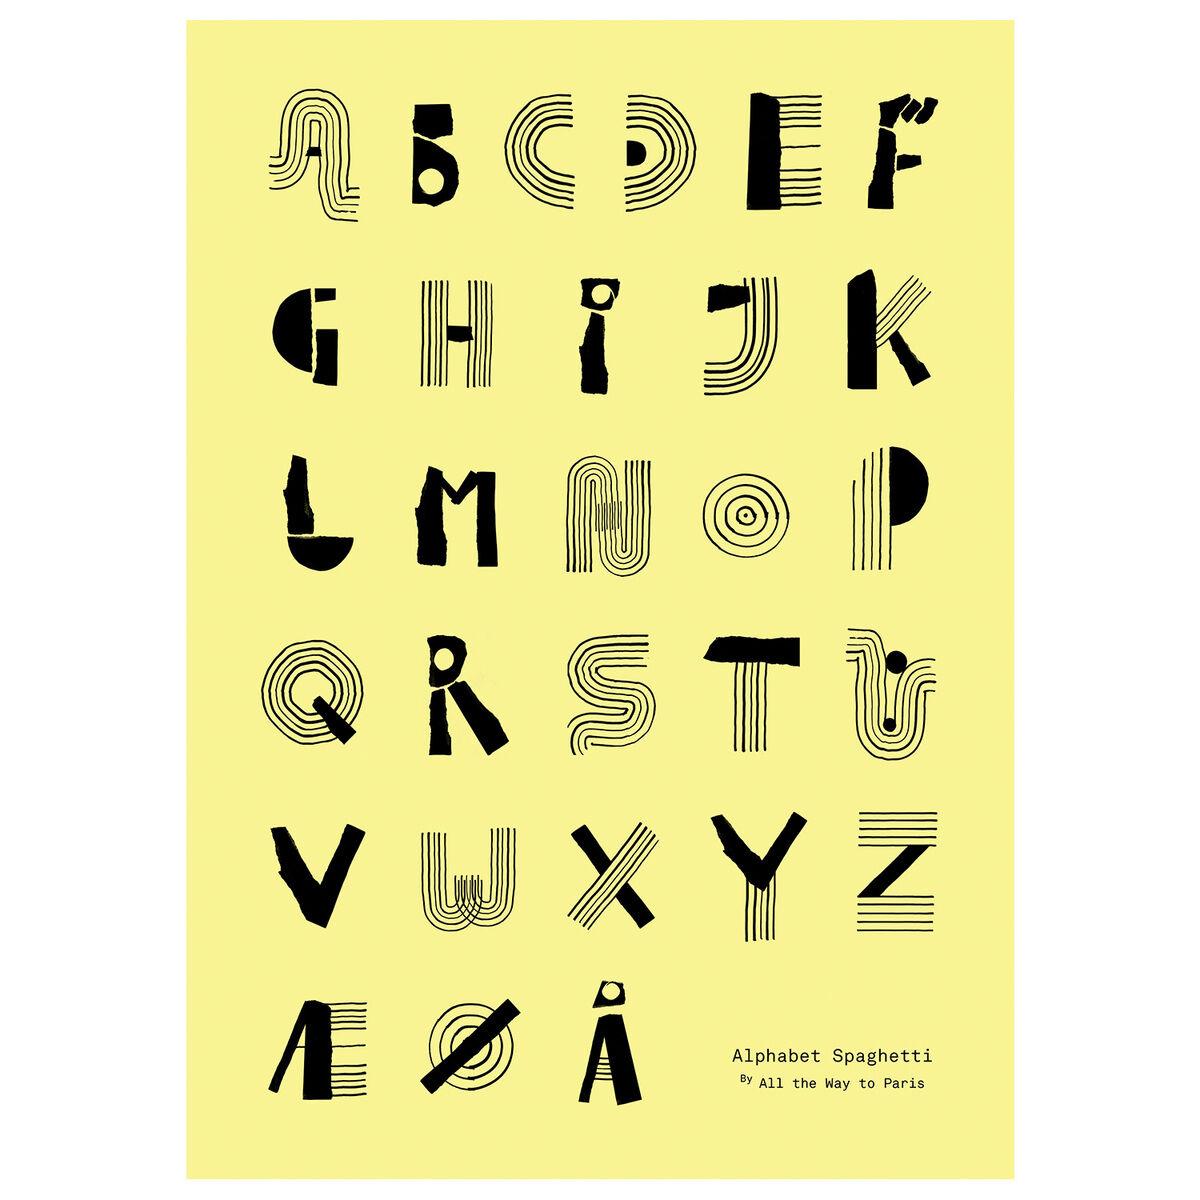 MADO Alphabet spaghetti juliste, 50 x 70 cm, keltainen